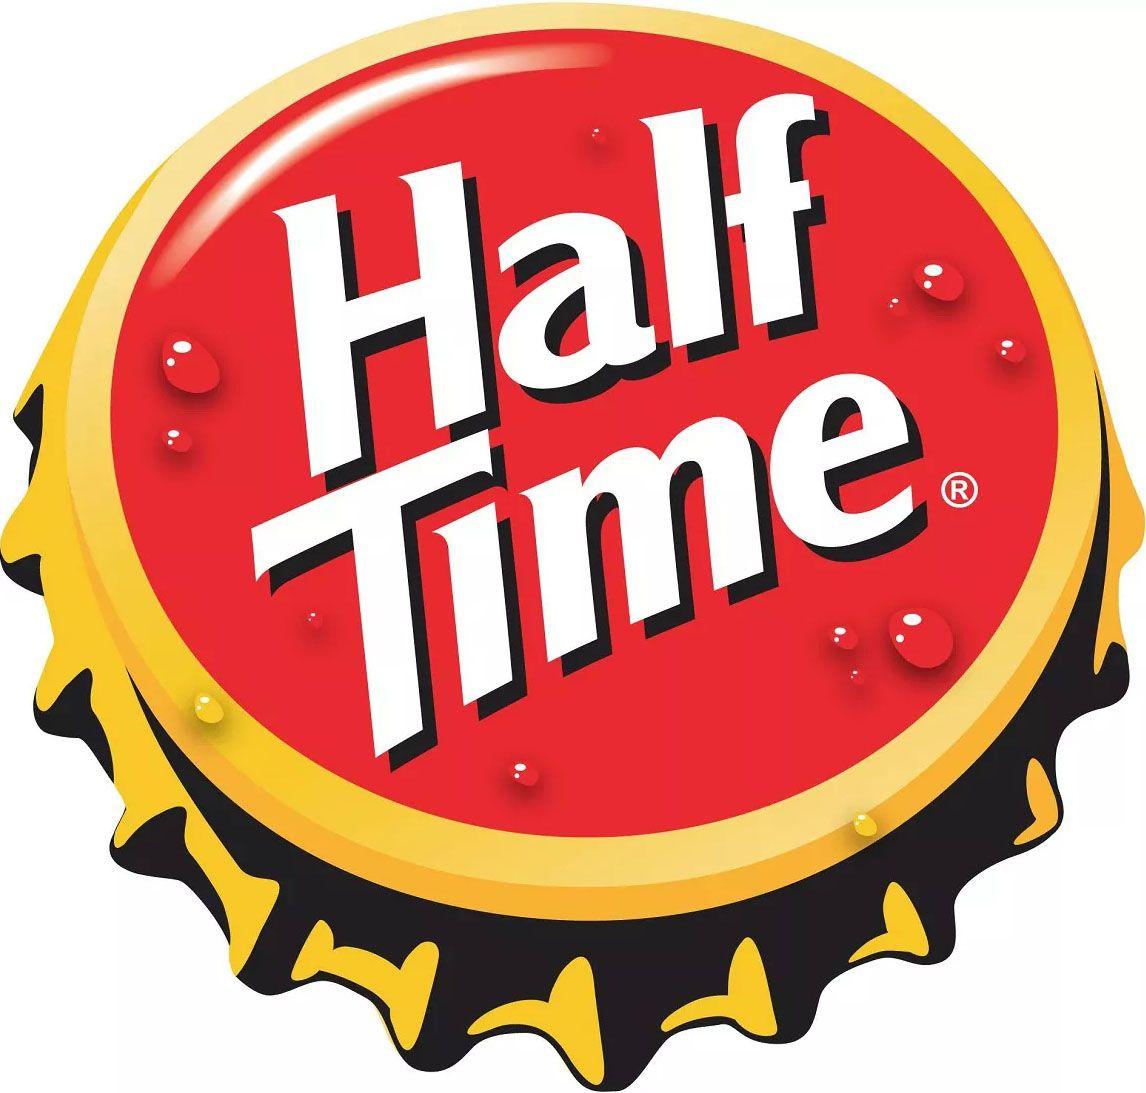 Half Time IPA Hop Head Beer Club